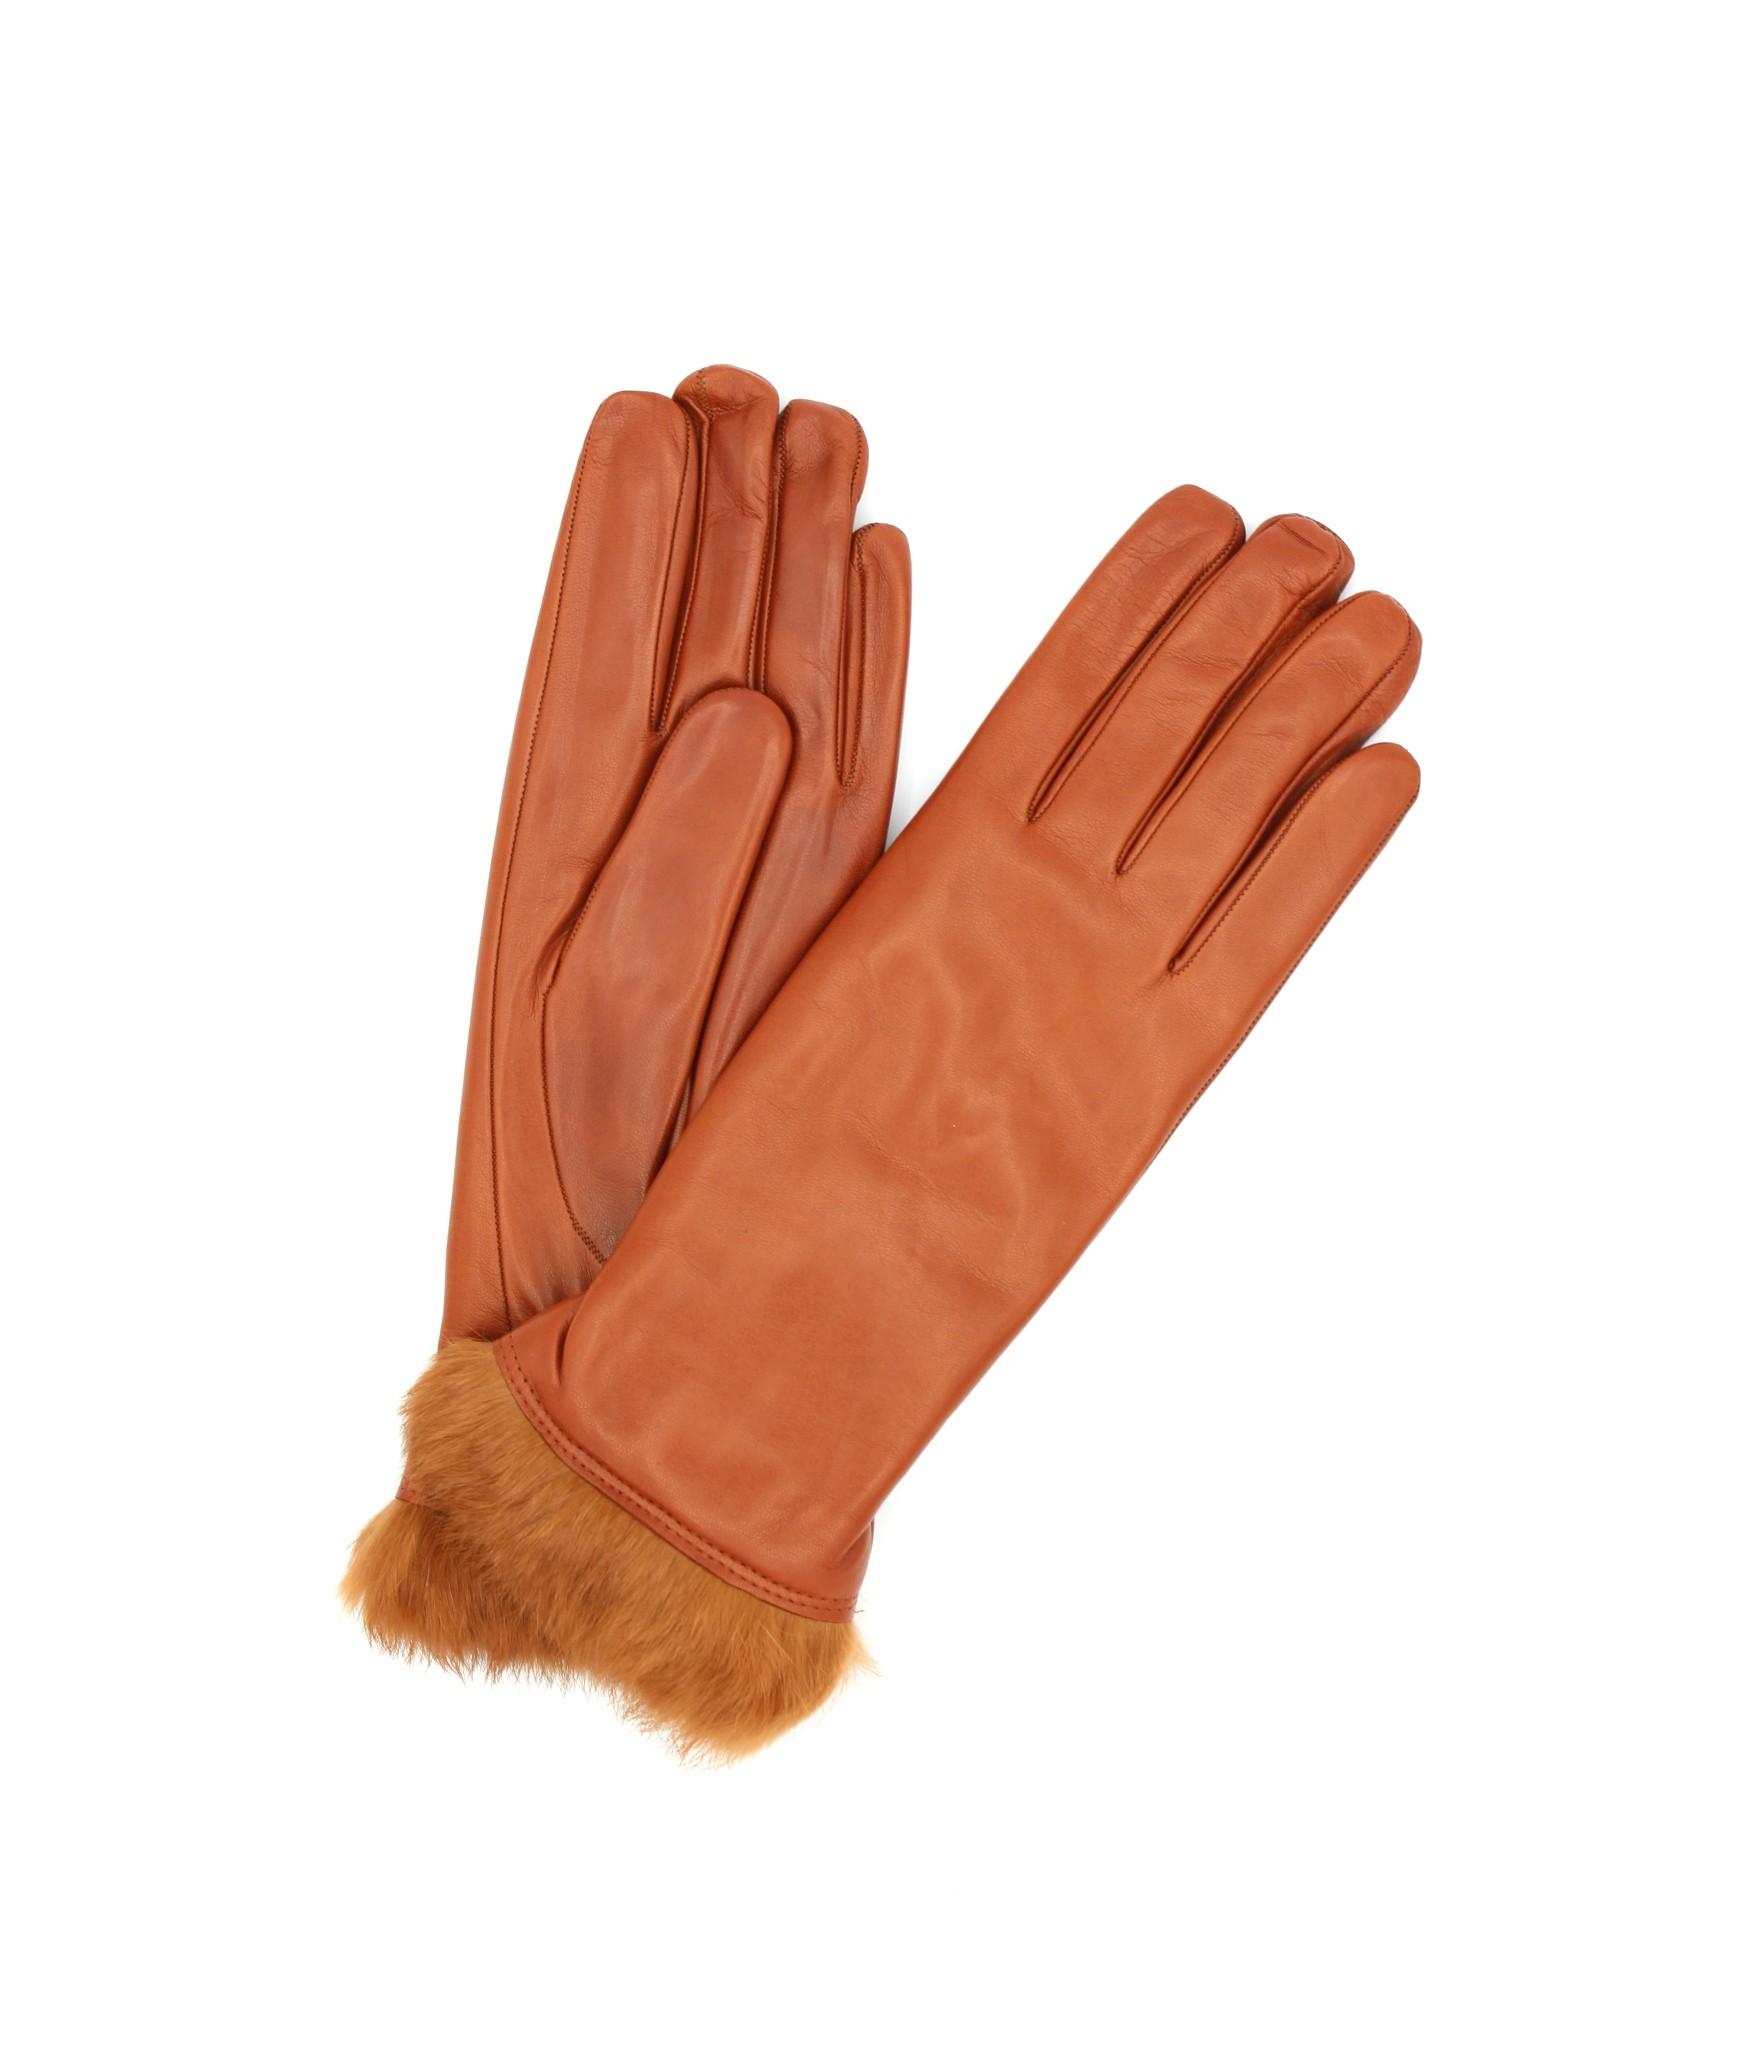 Nappa leather gloves 4bt Rabbir fur lined Tan Sermoneta Gloves